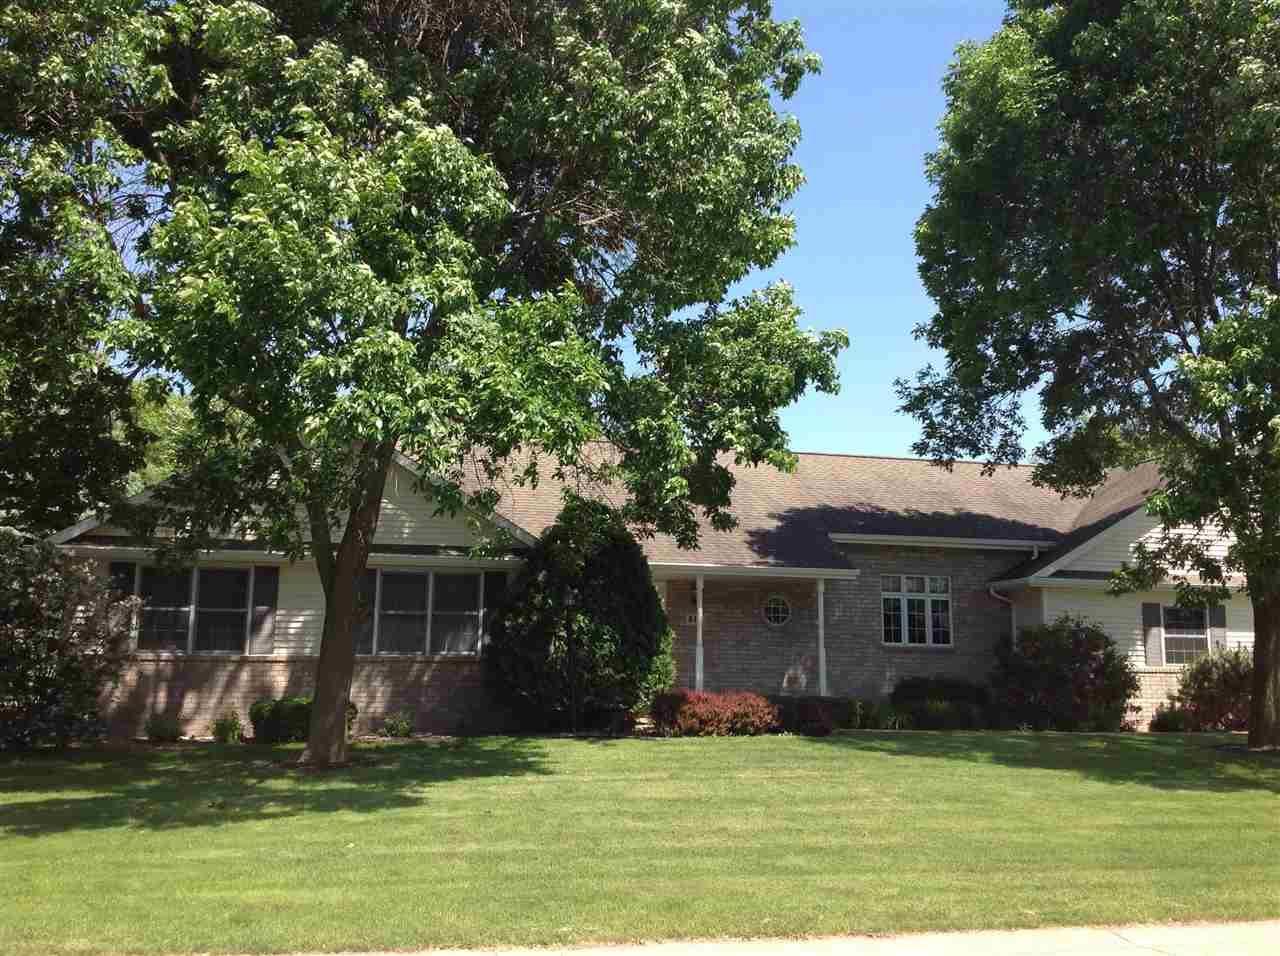 814 S GOLDENROD Drive, Appleton, WI 54914 - MLS#: 50241805